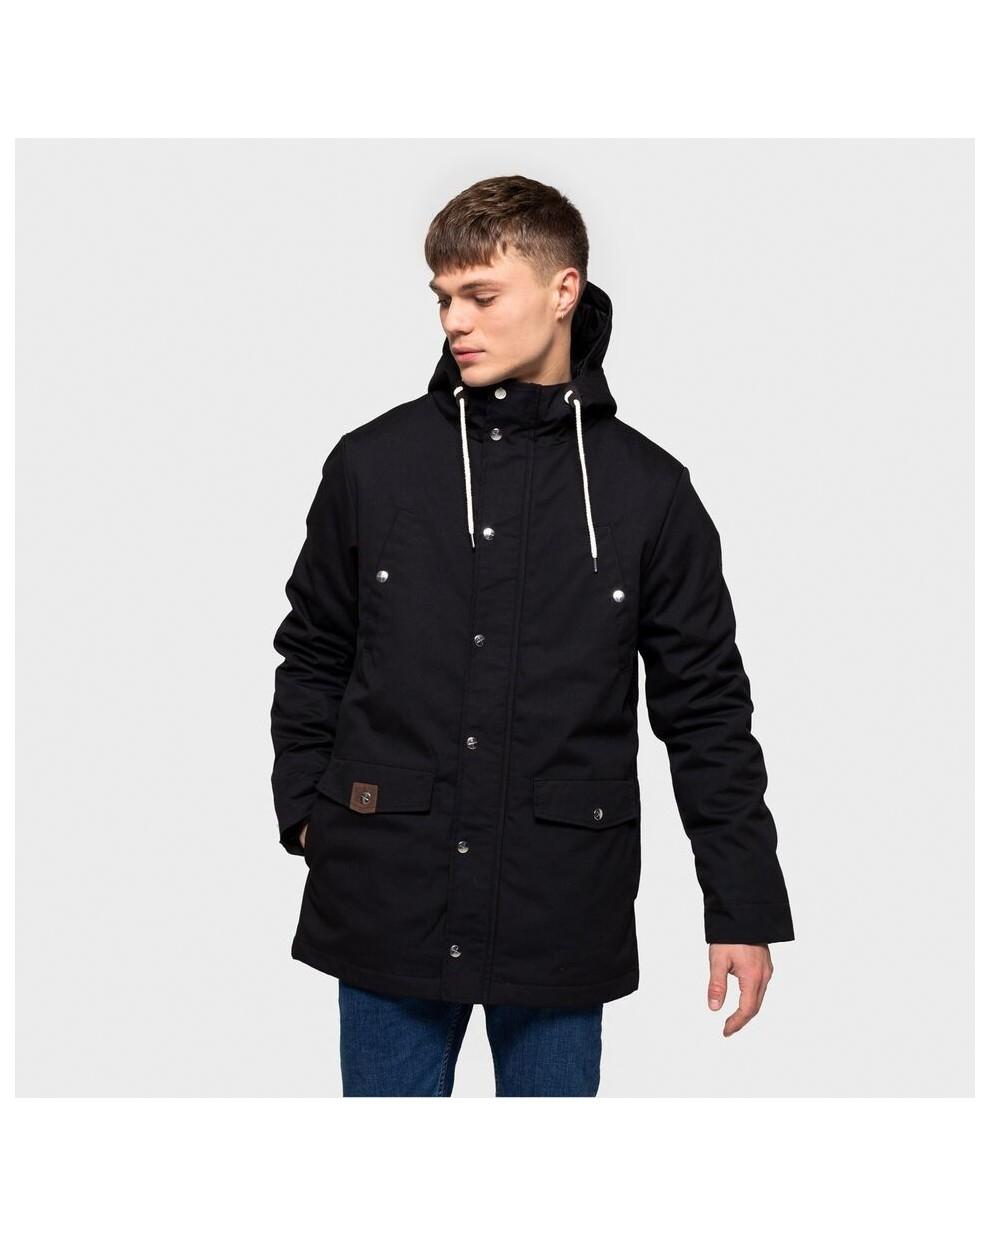 Chaqueta Parka Jacket 7246 - Black